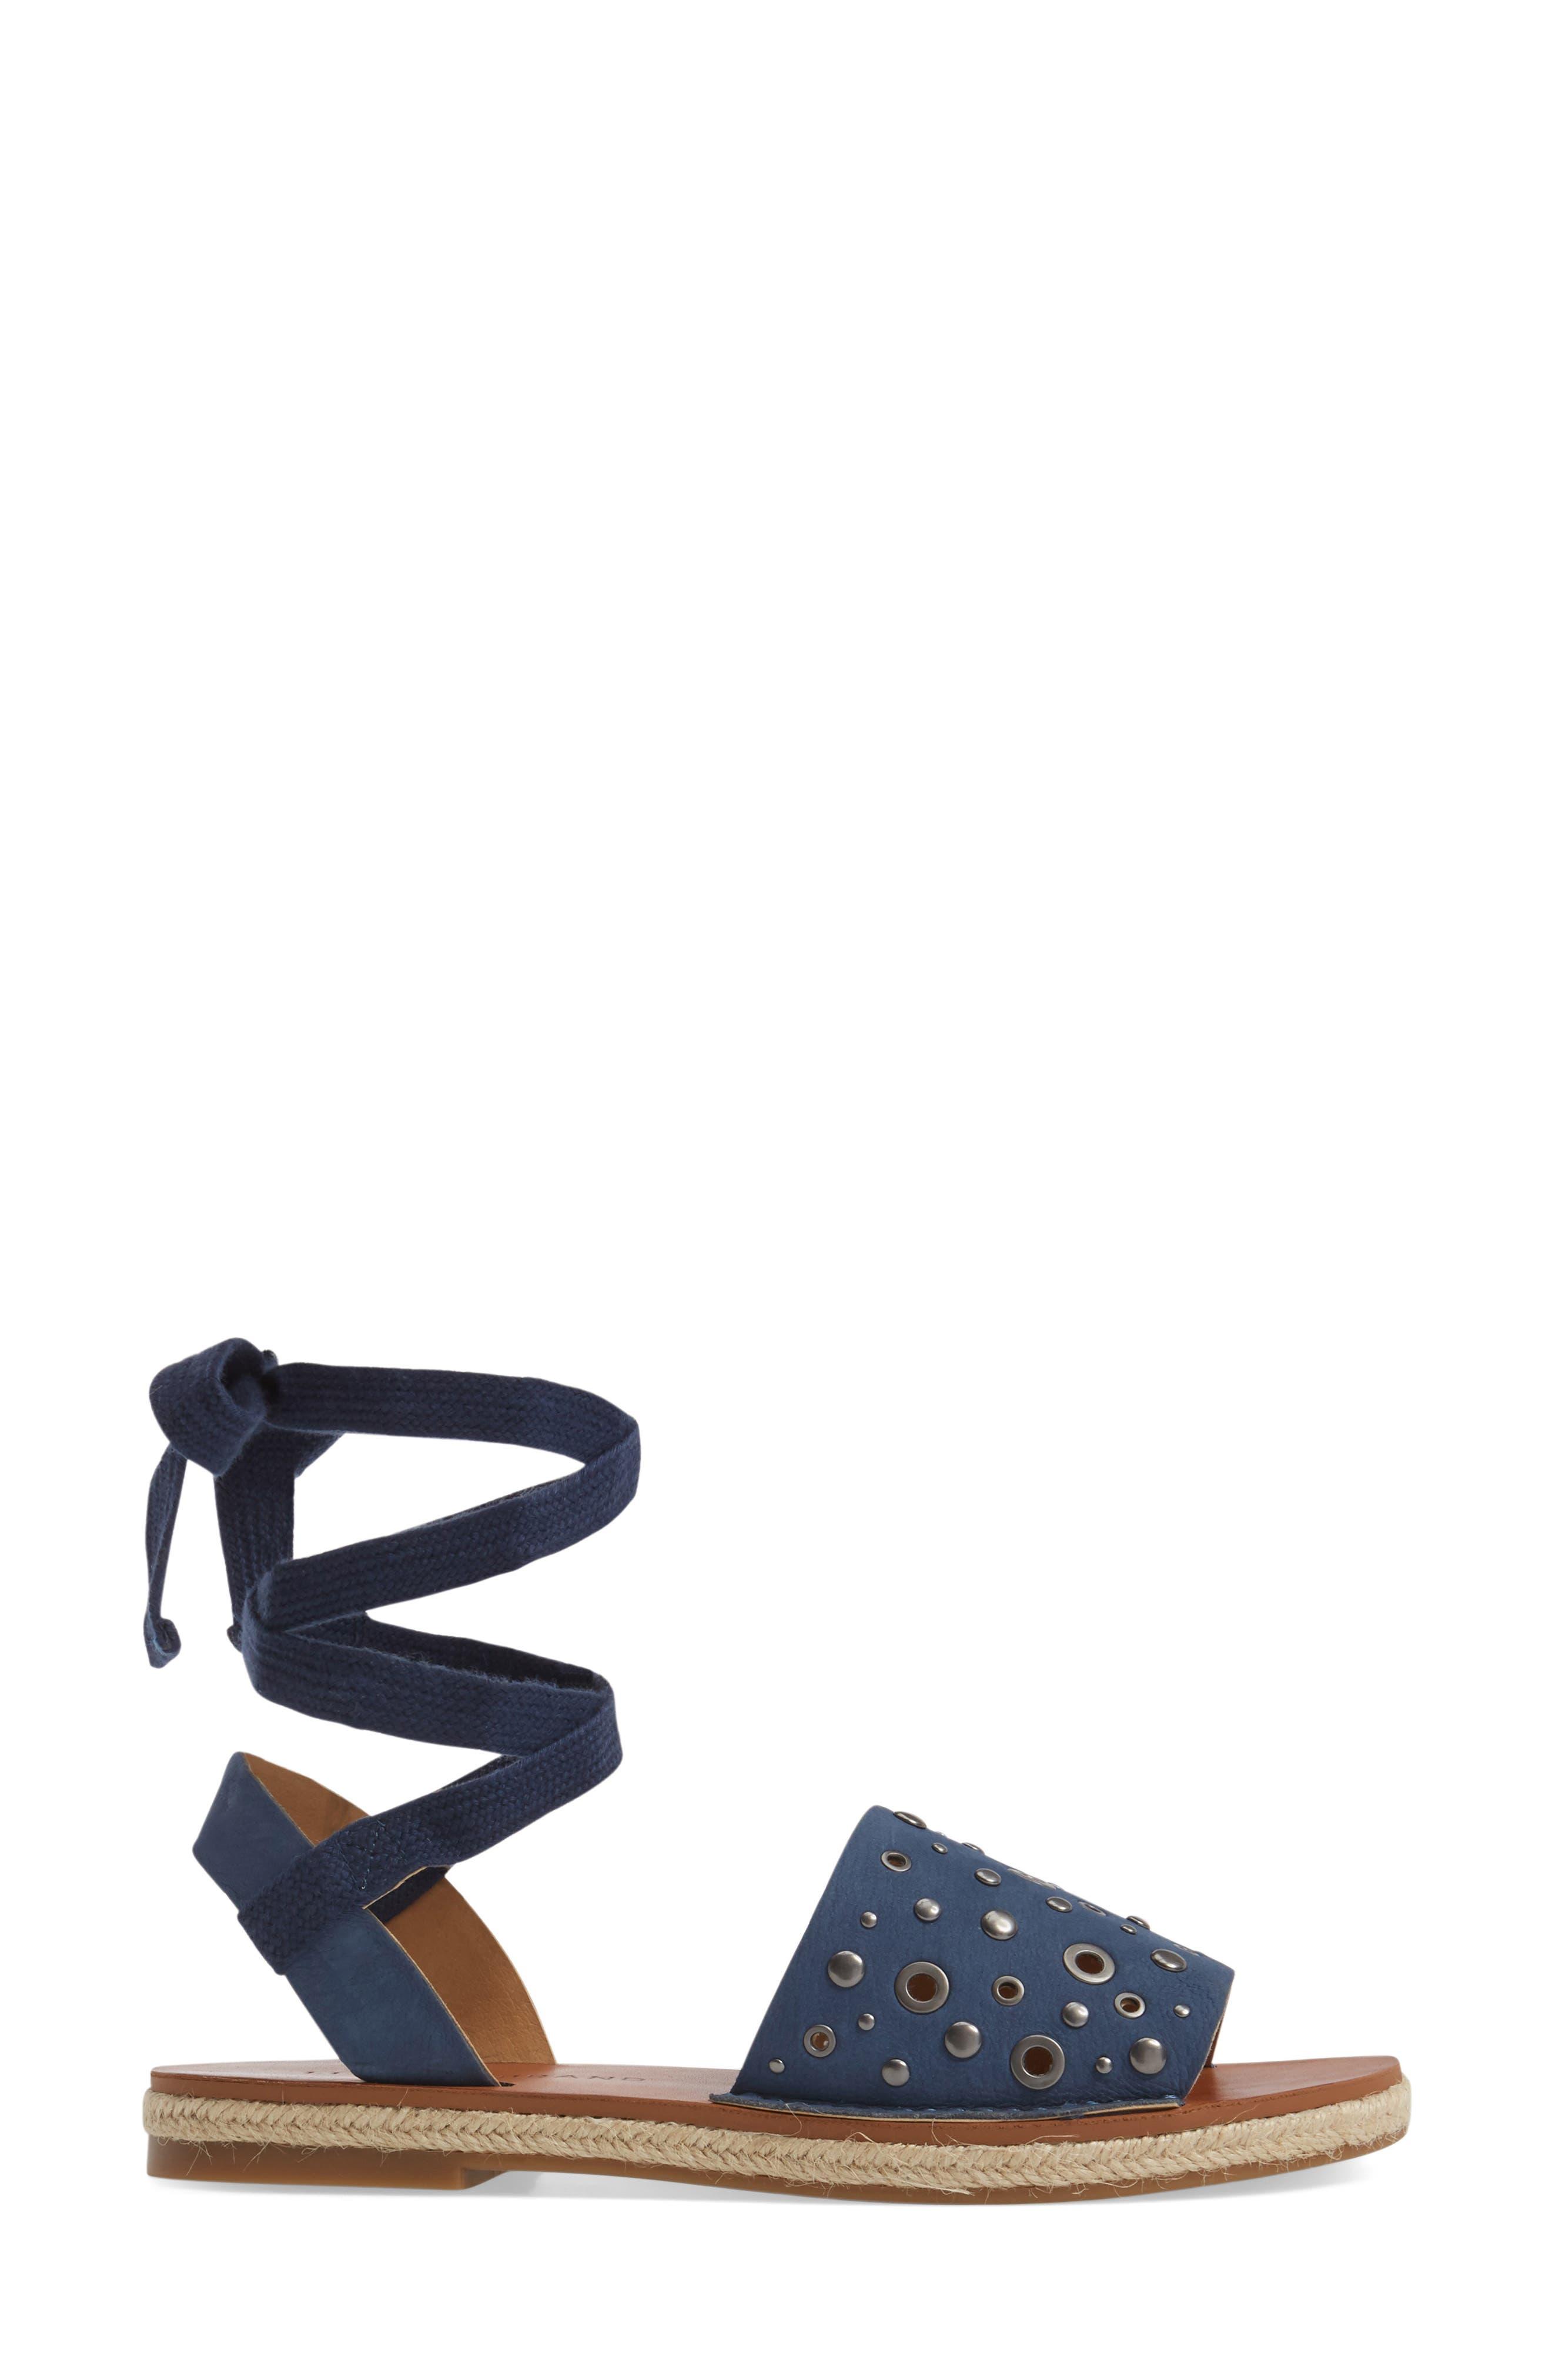 Daytah Ankle Tie Sandal,                             Alternate thumbnail 3, color,                             Dark Chambray